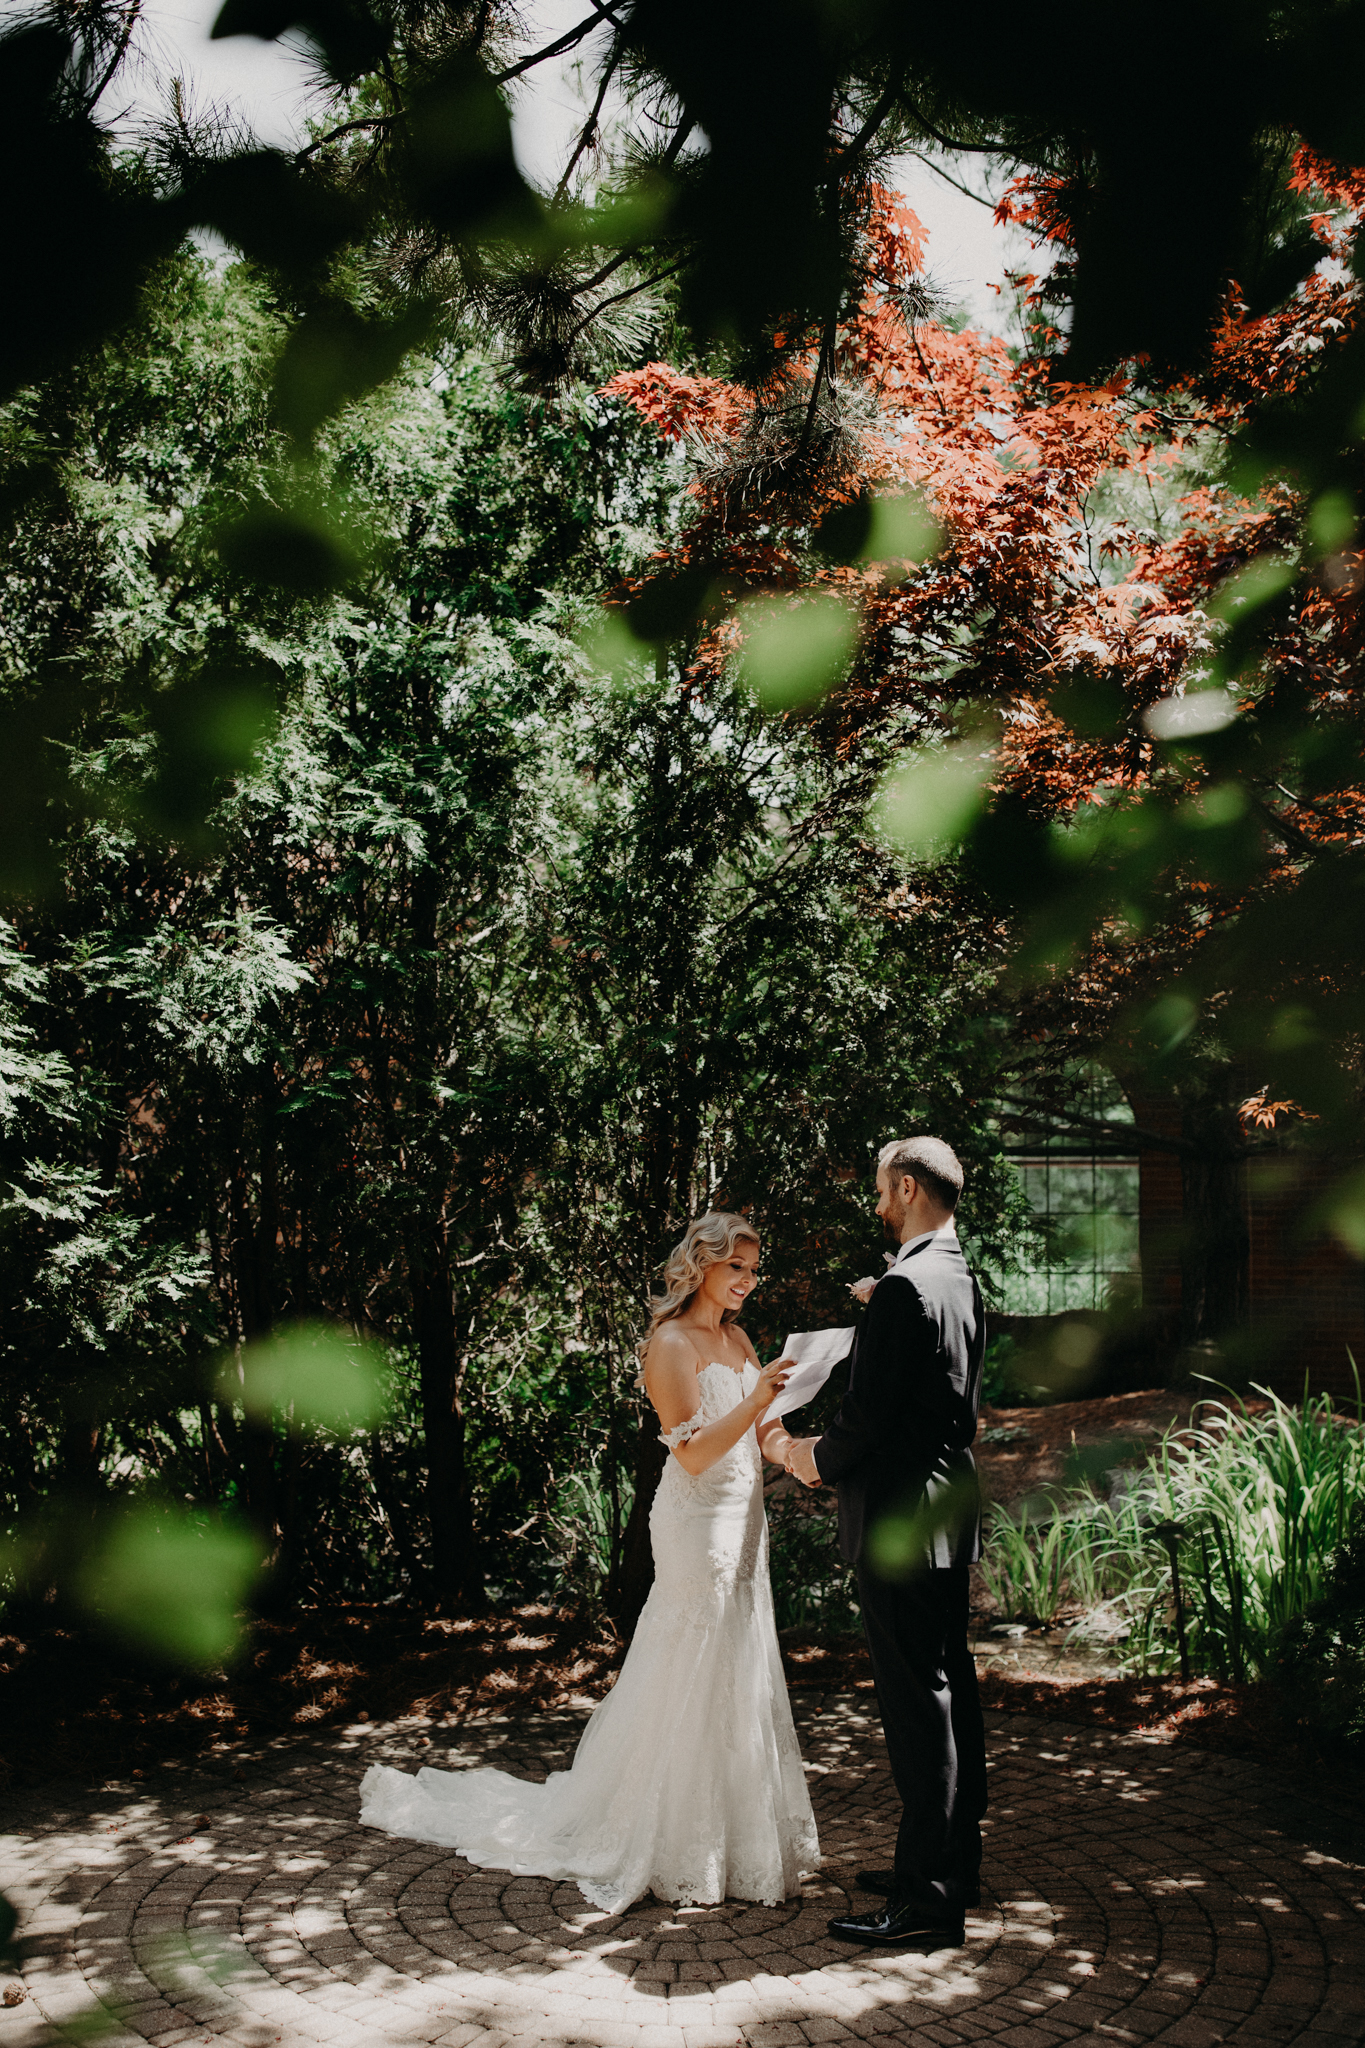 The-Inn-At-St-Johns-Wedding-13.jpg